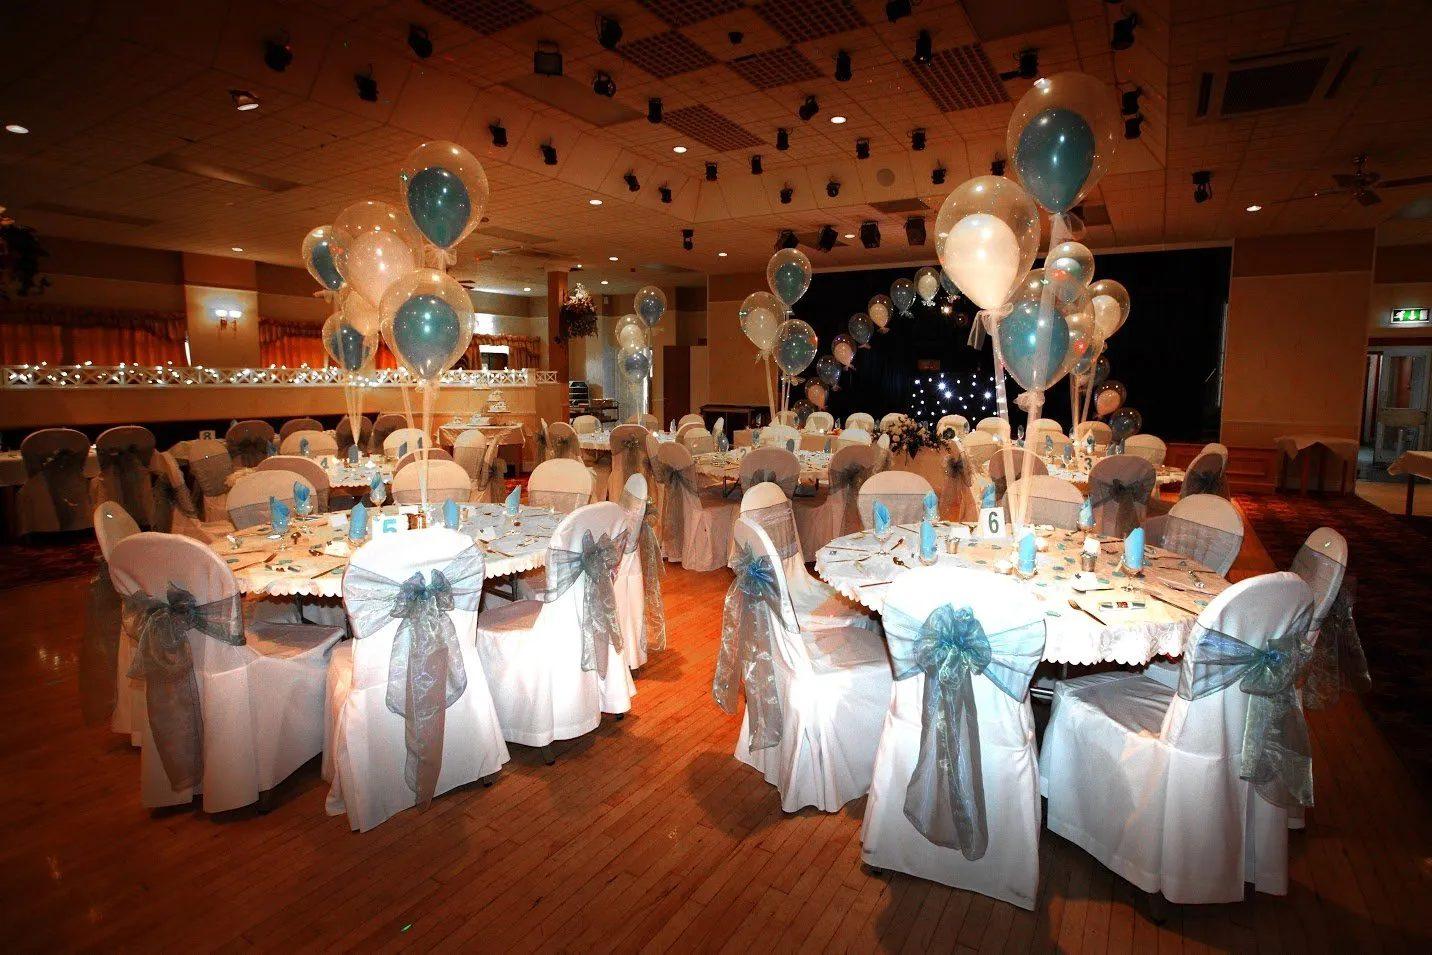 Standard Triumph Club blue and white wedding reception